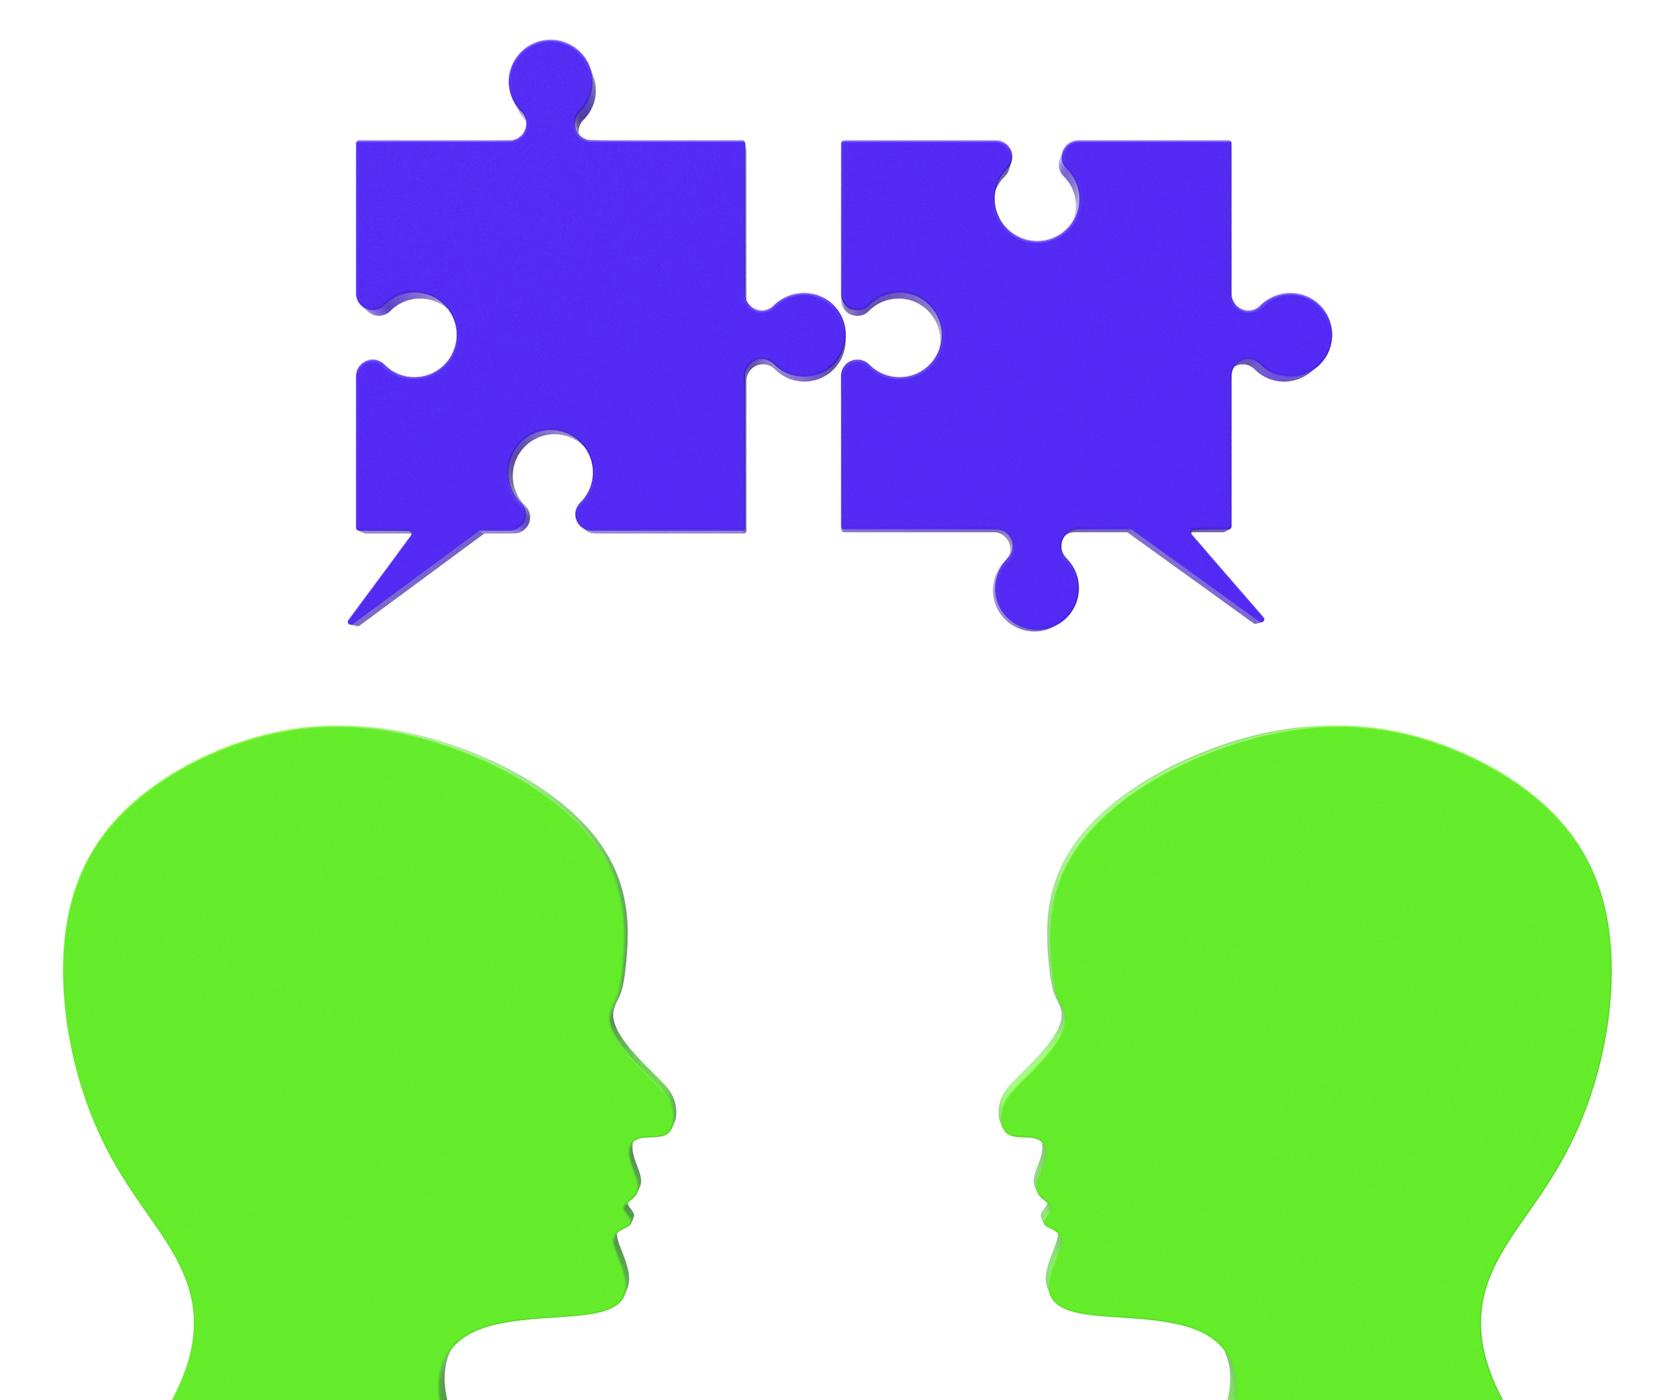 Speech Bubble Means Jigsaw Puzzle And Assemble, Assemble, Gossip, Speechbubble, Speaking, HQ Photo